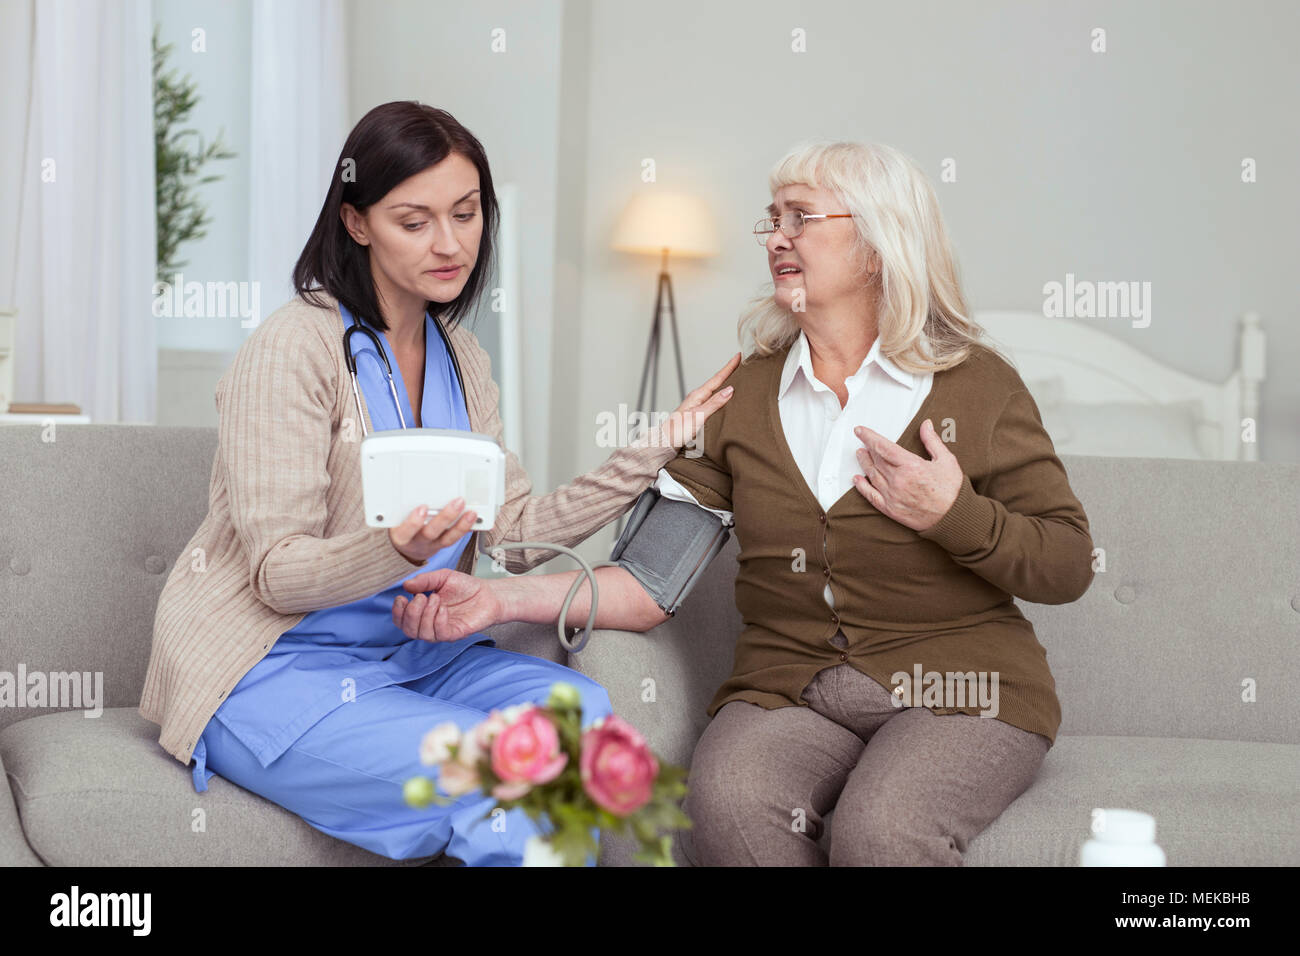 Uneasy elder woman complaining on blood pressure - Stock Image